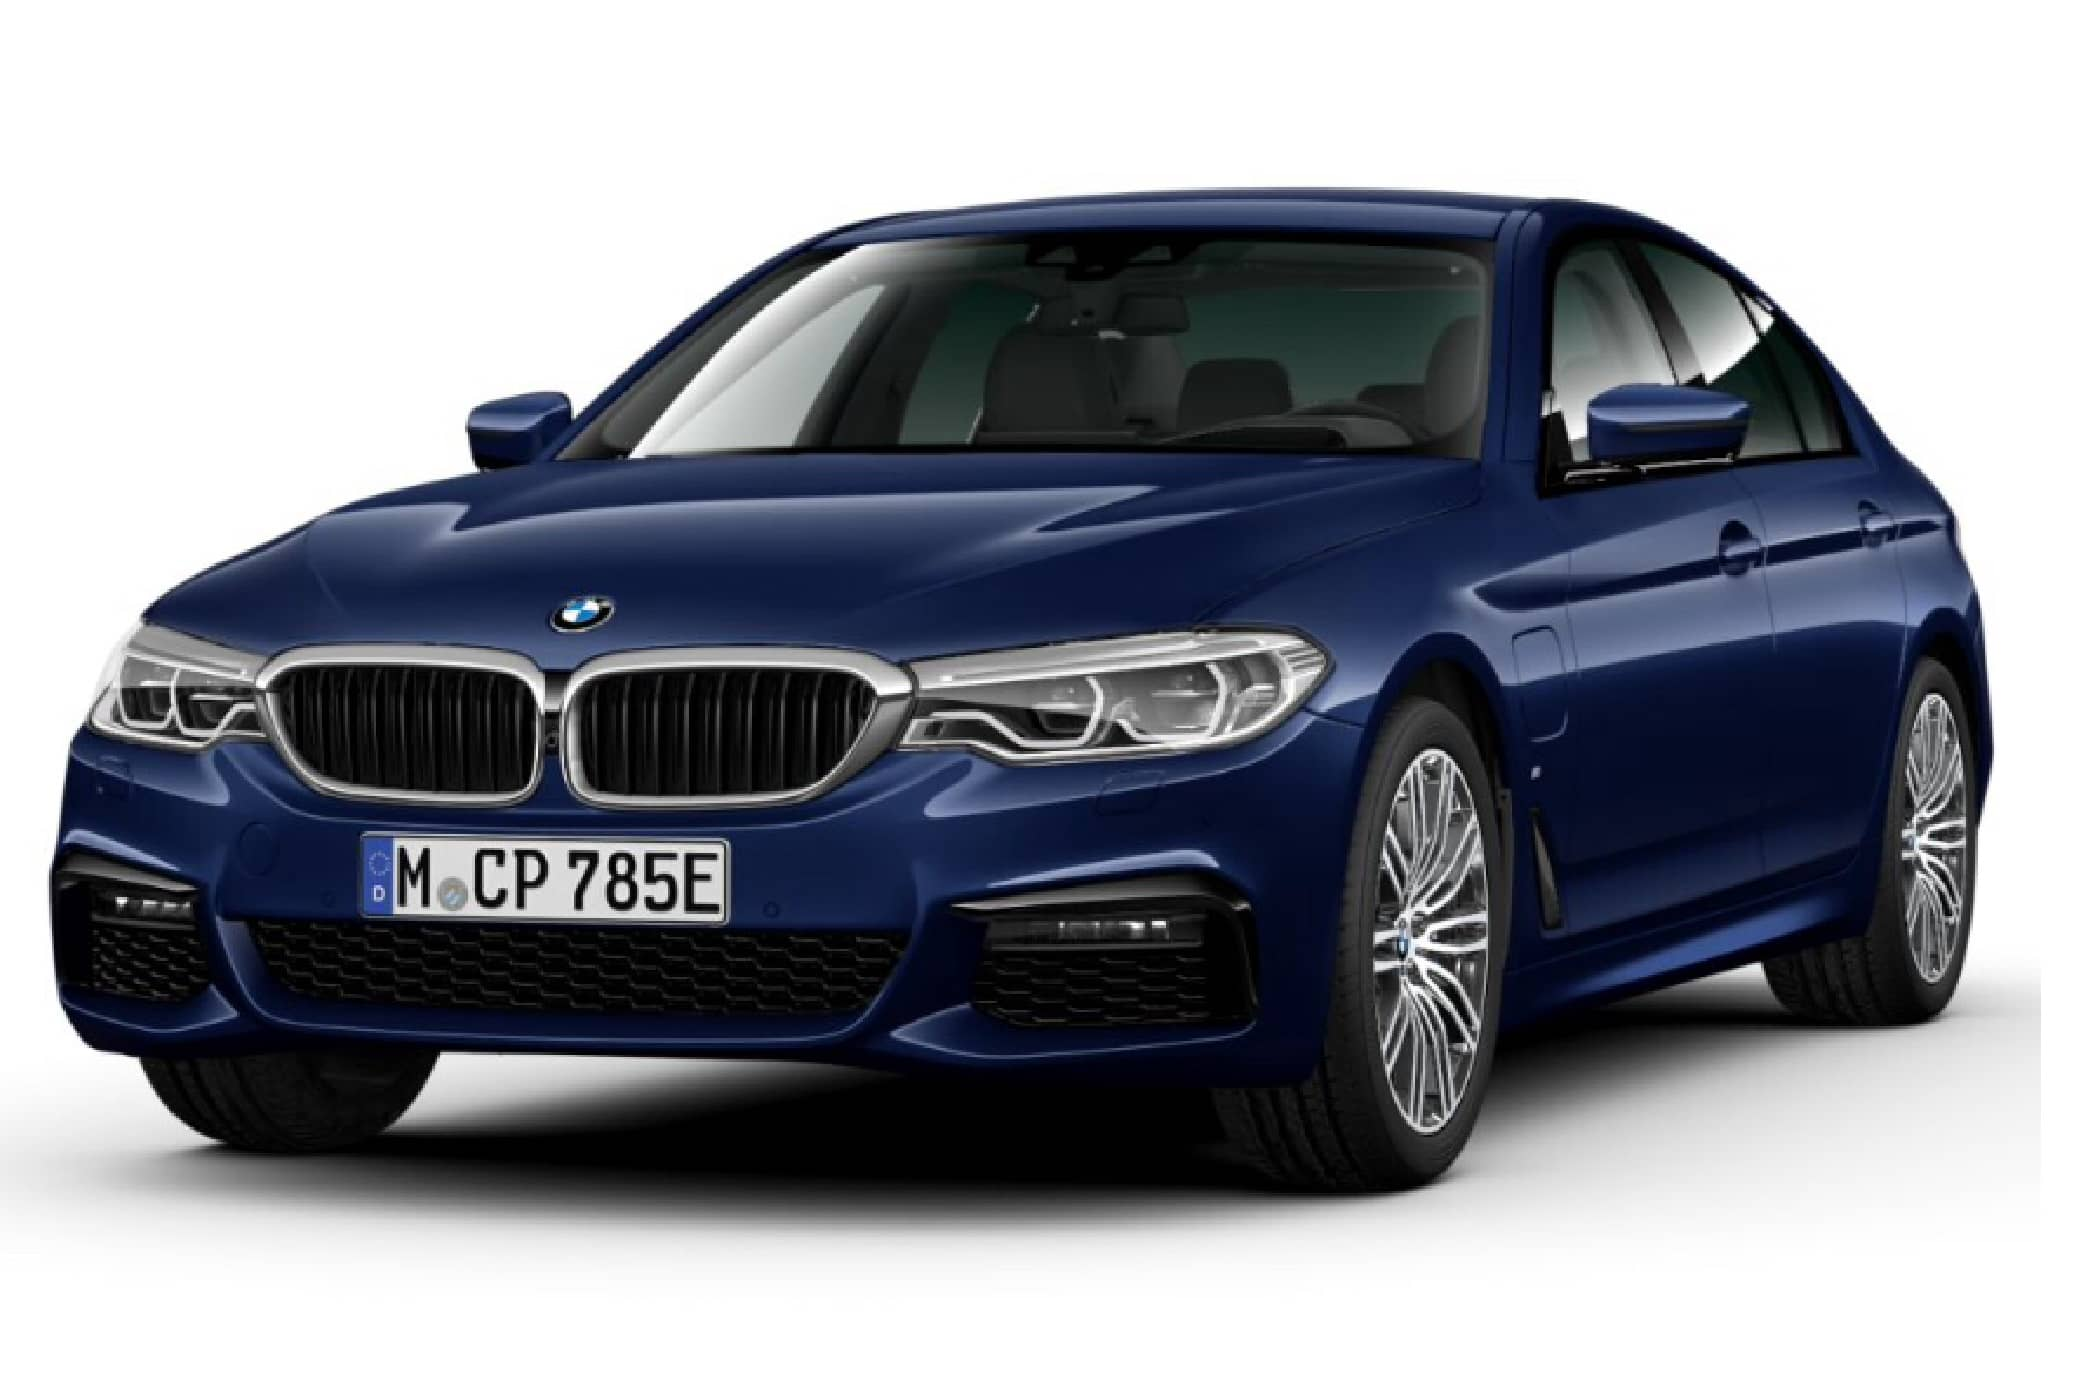 Ремонт подвески BMW серии 5